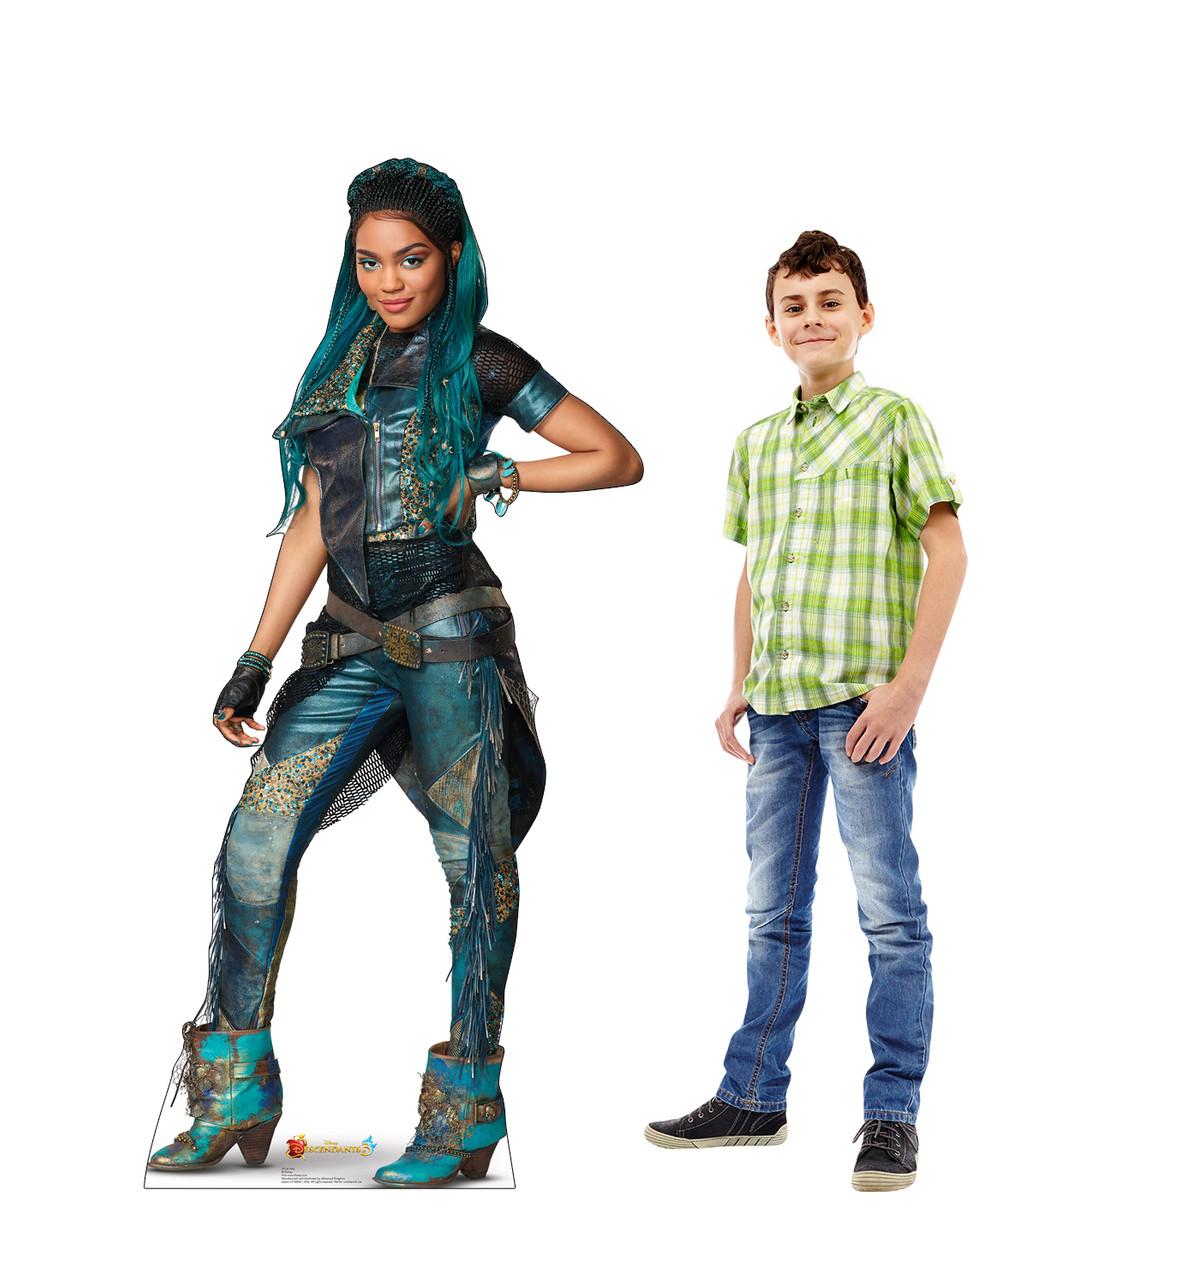 Uma - Disney's Descendants 3 Cardboard Cutout Lifesize